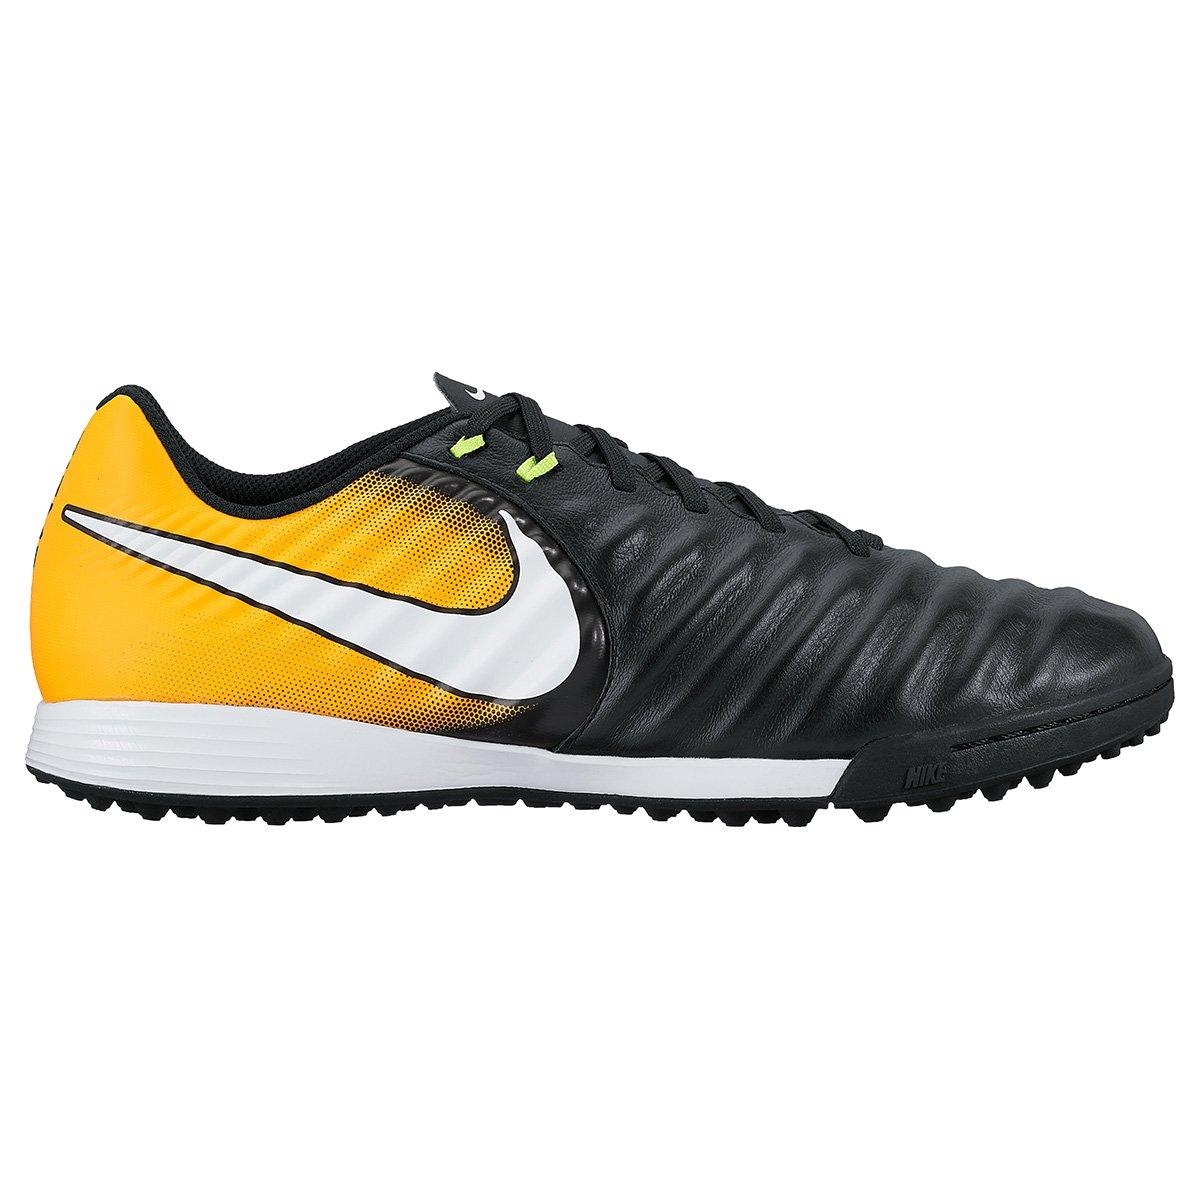 f985b1ccc3 Chuteira Society Nike Tiempo Ligera 4 TF - Preto e Laranja - Compre ...